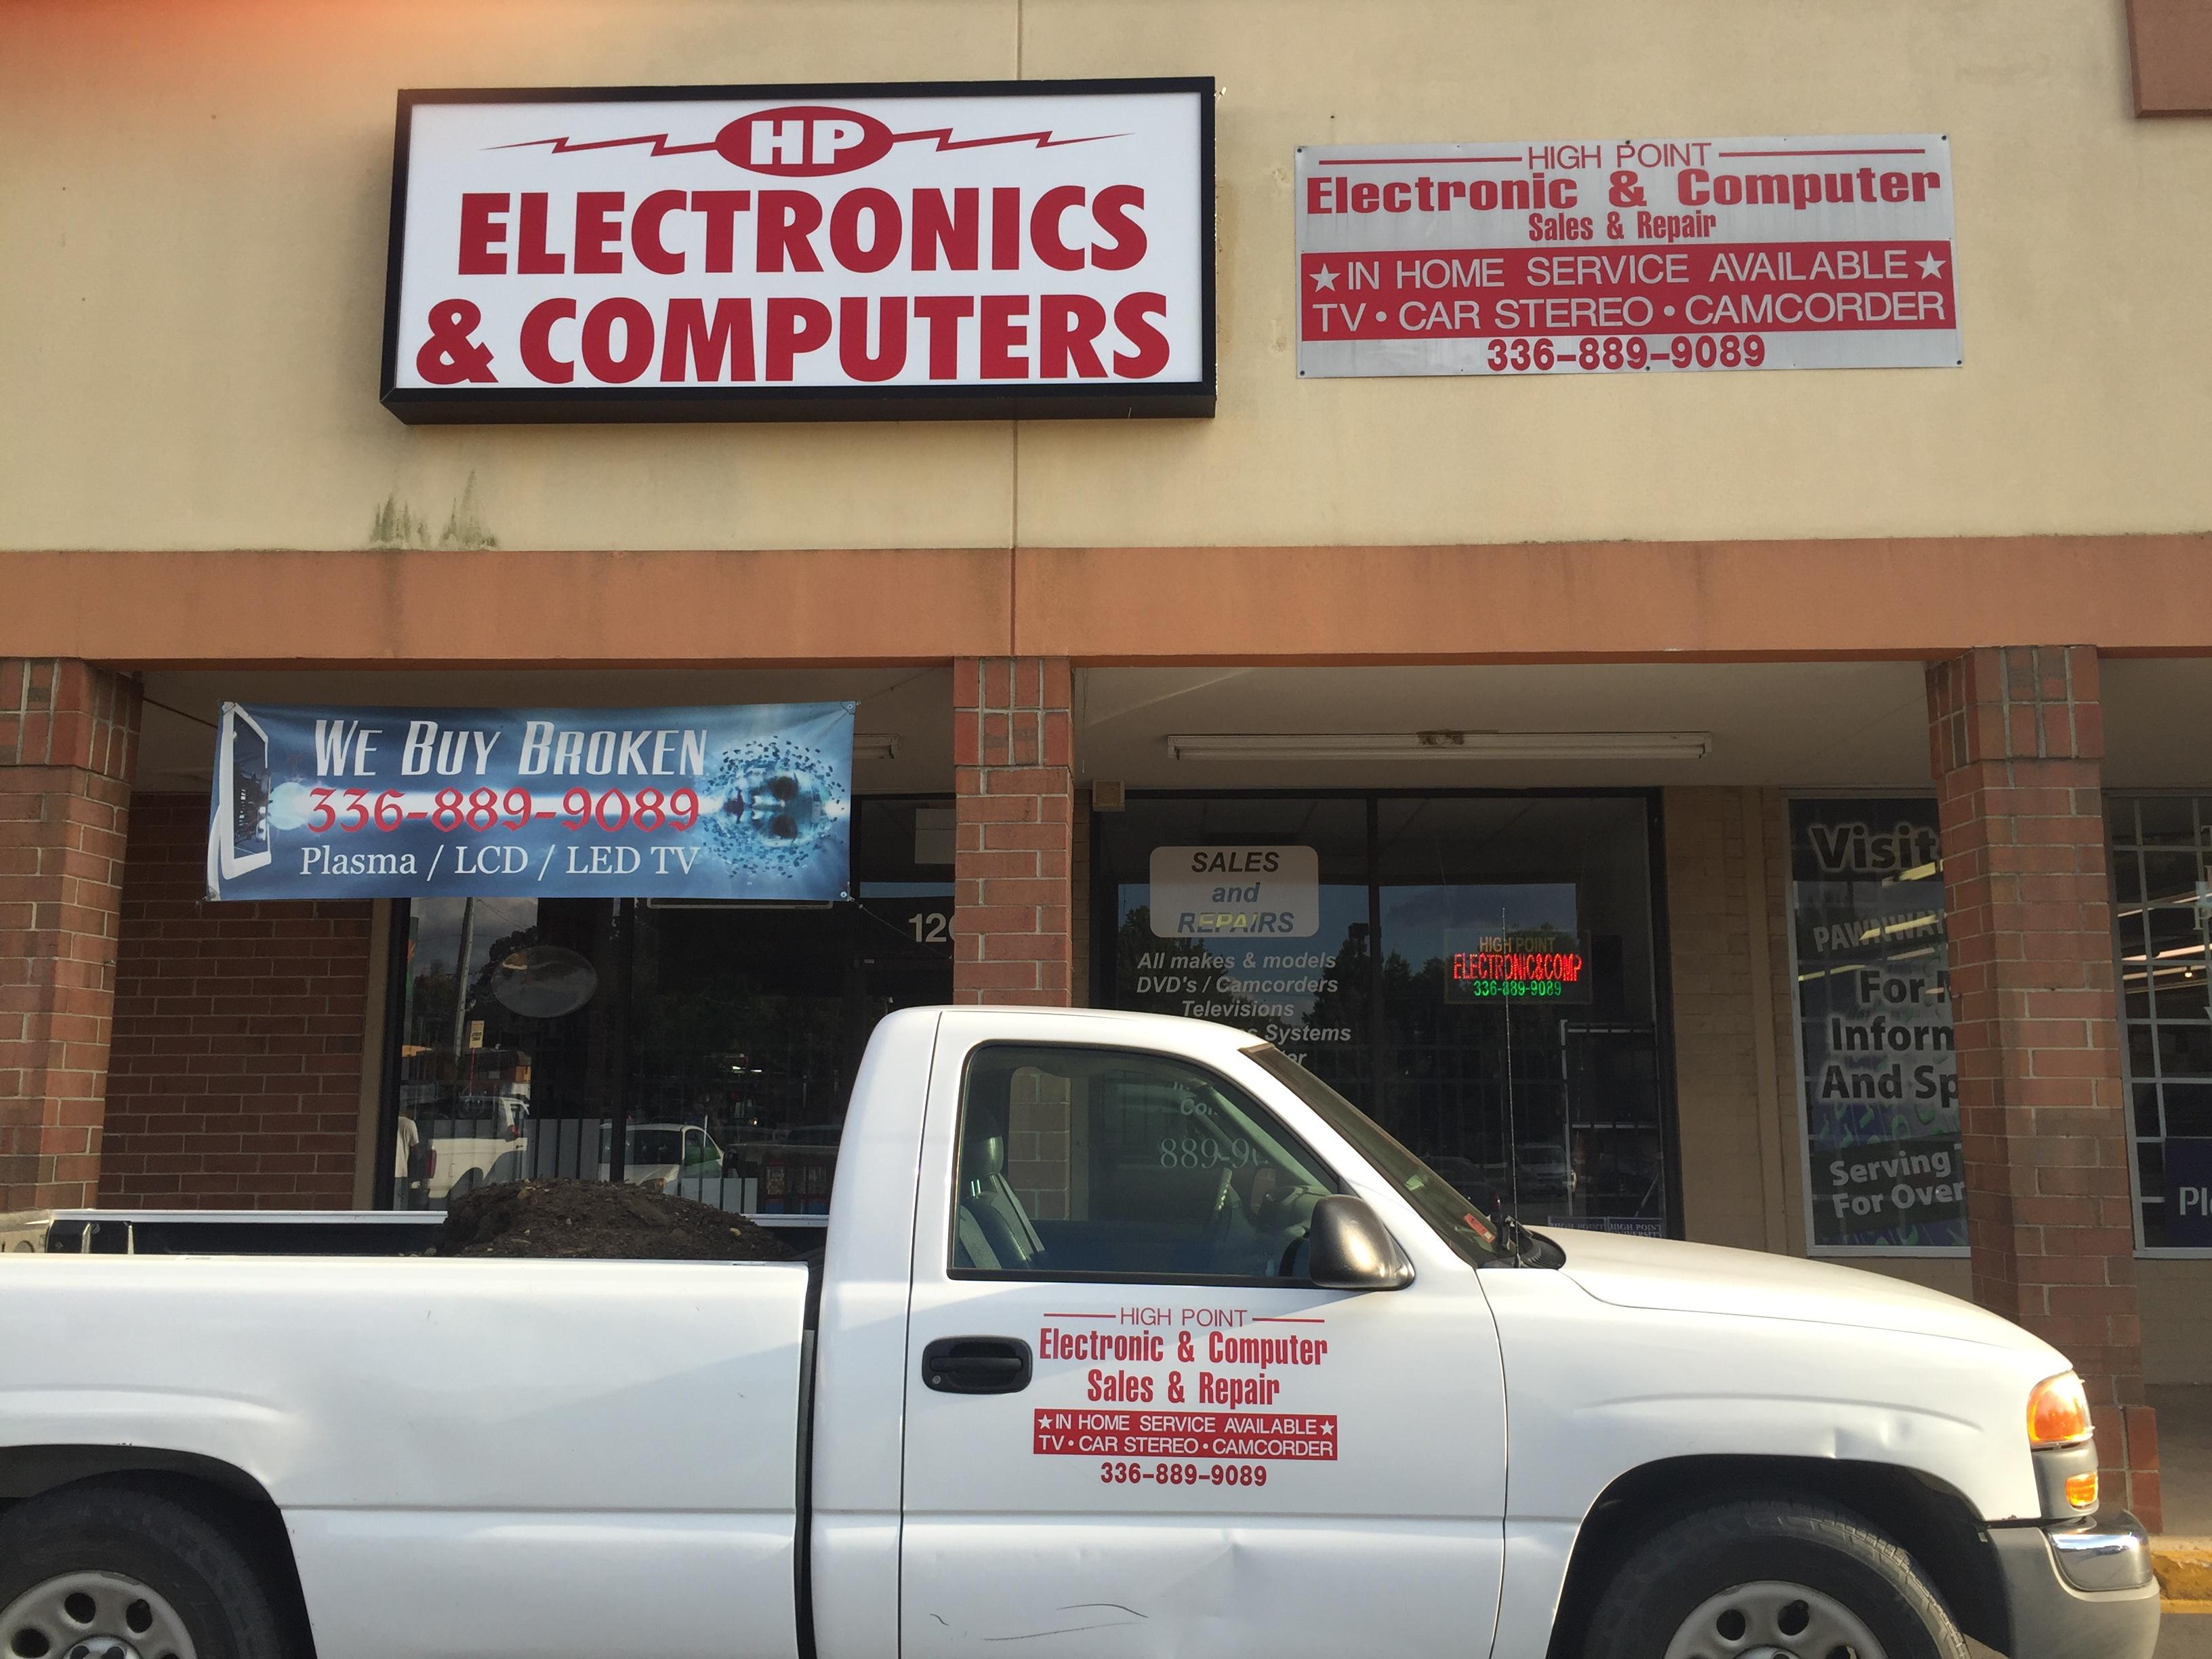 High Point Electronics & Computer 110 E Fairfield Rd, High